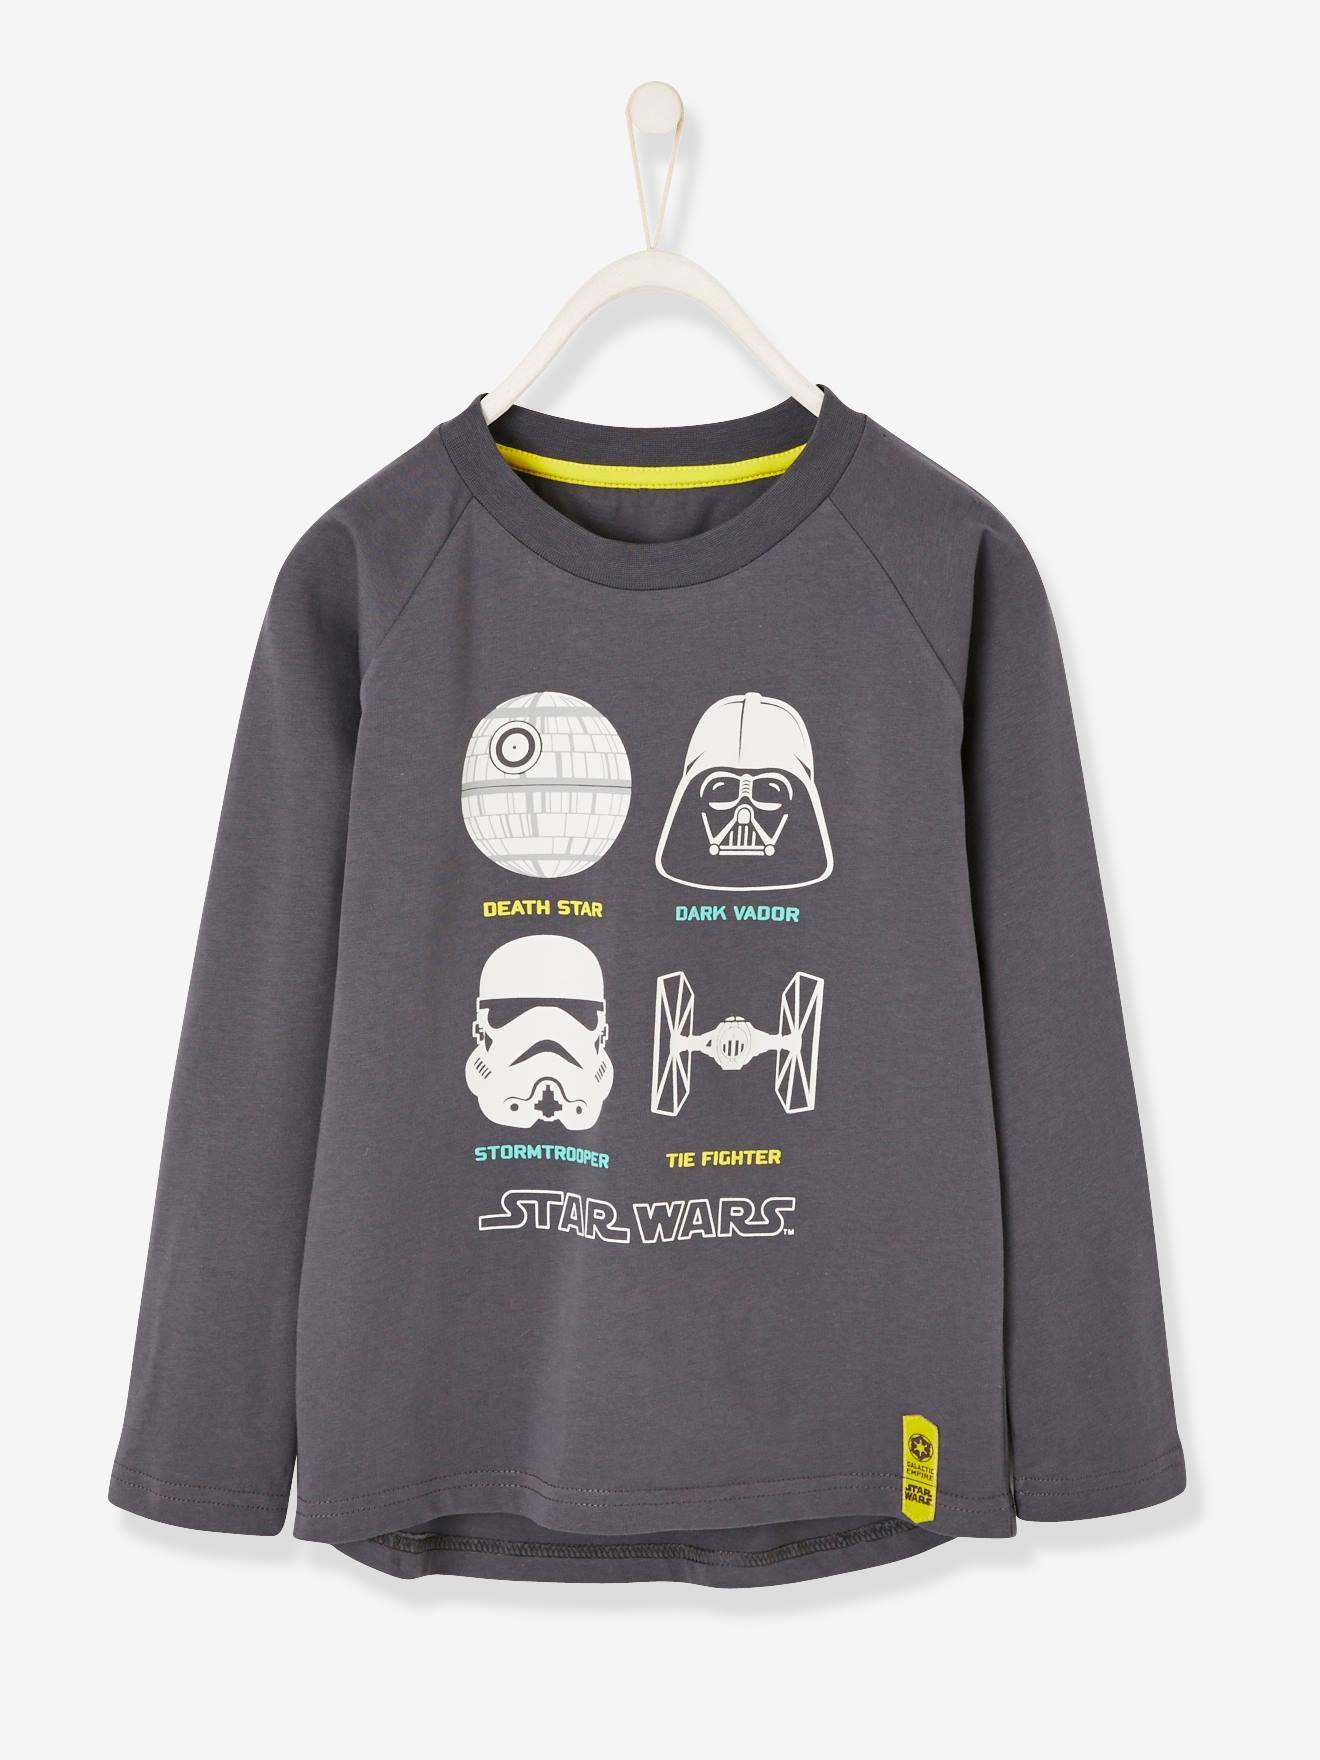 Star Wars Jungen Shirt STAR WARS grau Gr. 92